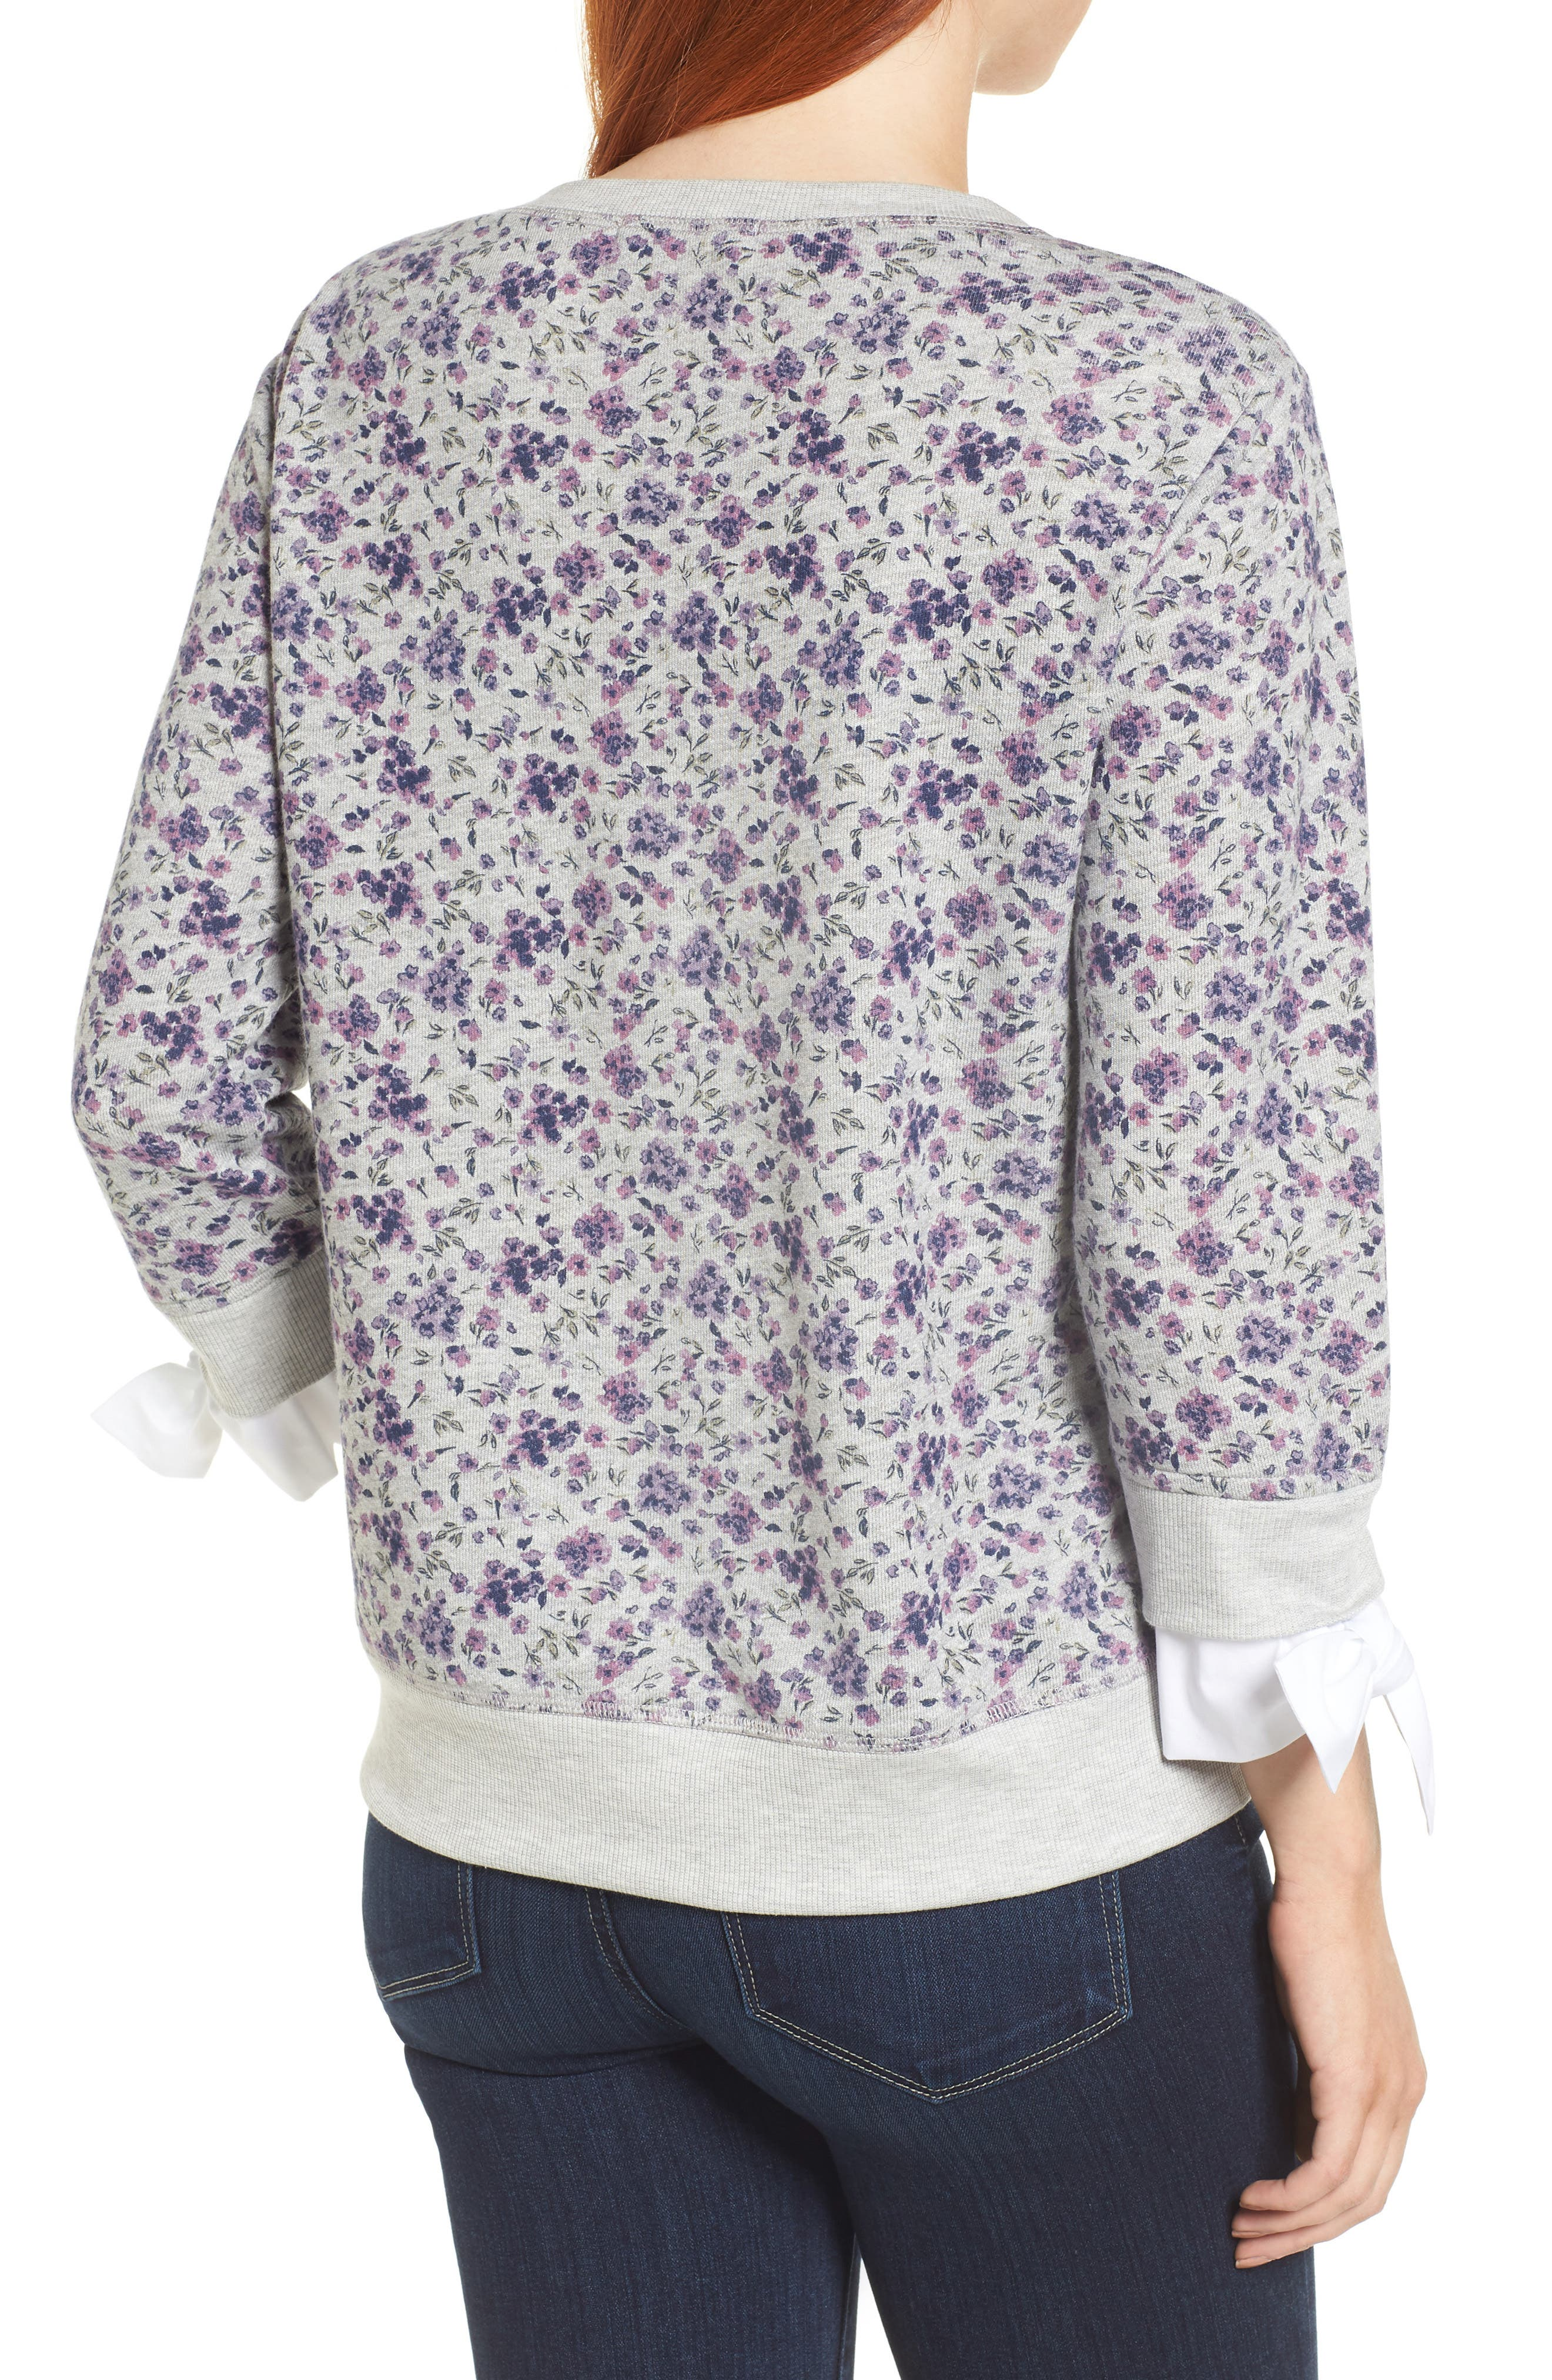 Poplin Cuff Sweatshirt,                             Alternate thumbnail 2, color,                             GREY FLORAL W/ WHITE POPLIN